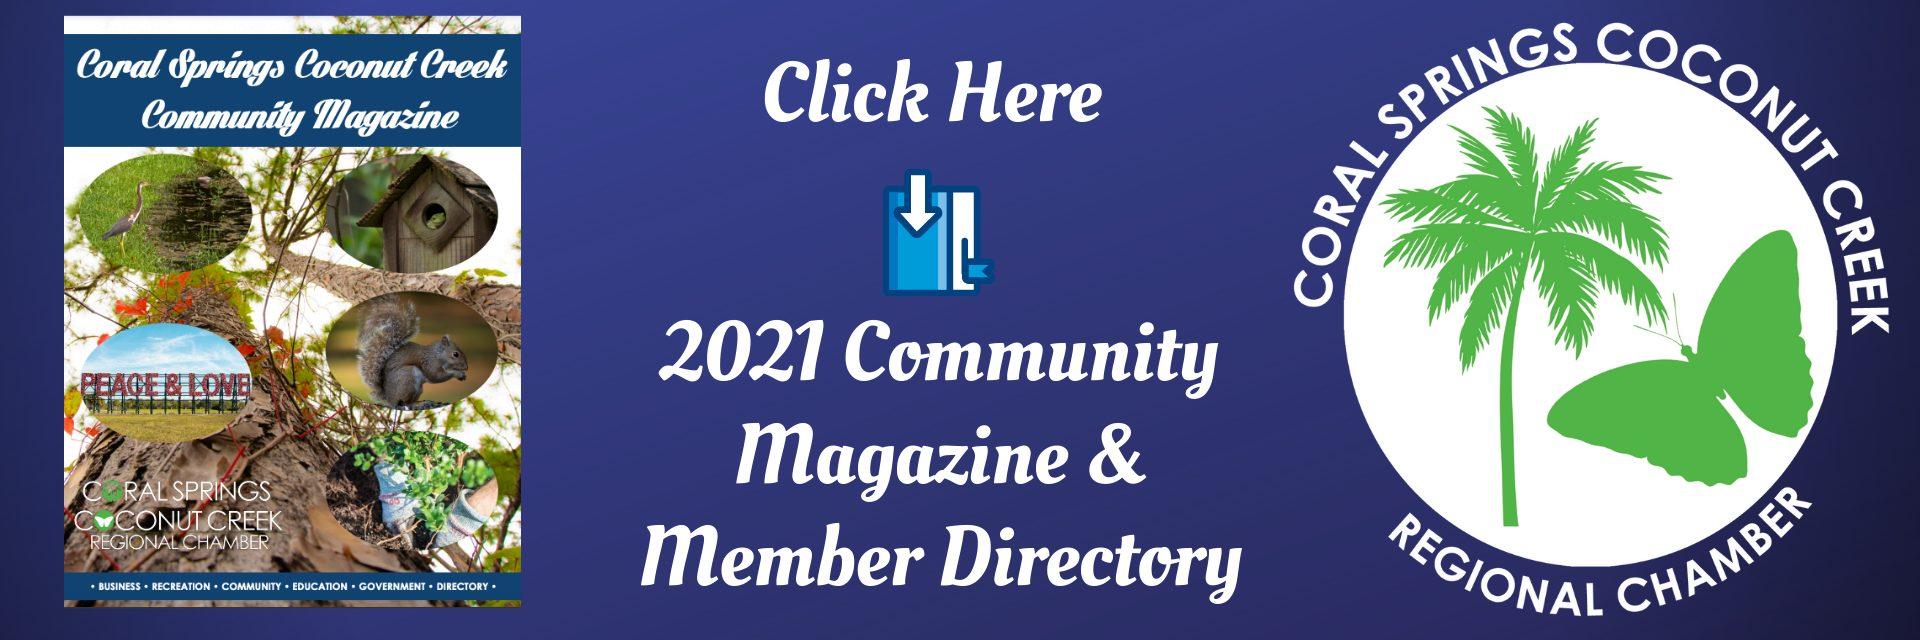 2021 community magazine link